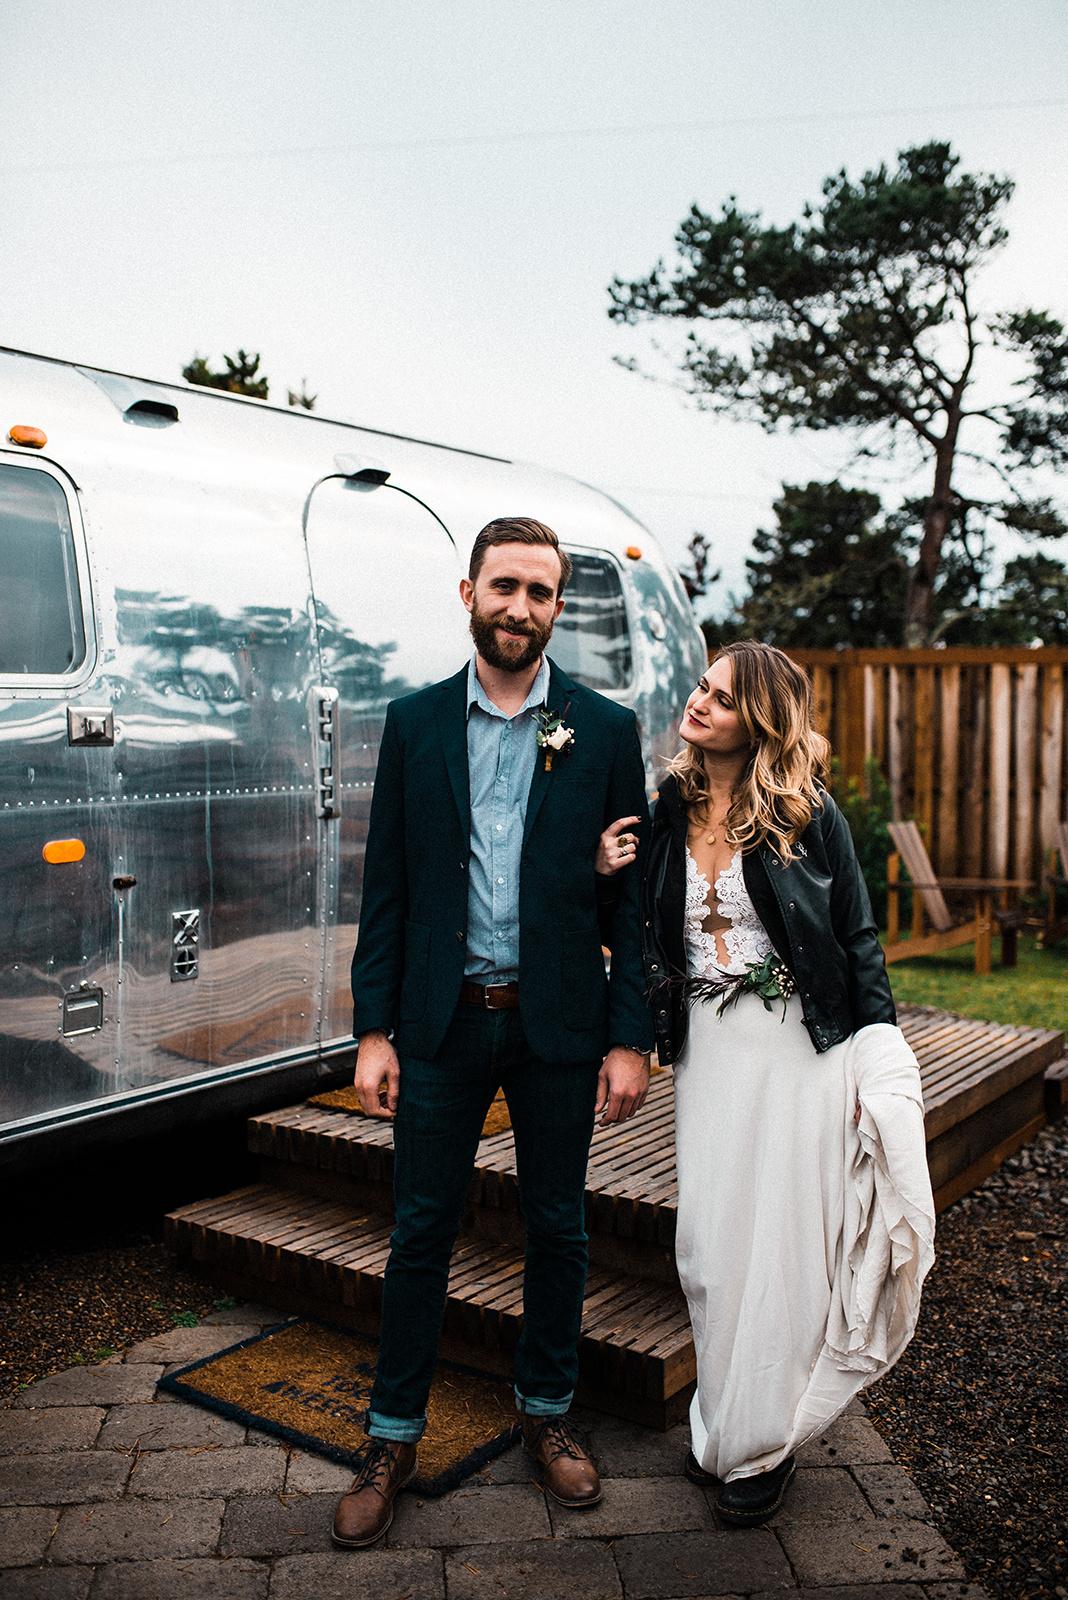 Oregon_Coast_Elopement_Wedding_The_Foxes_Photography_073.jpg